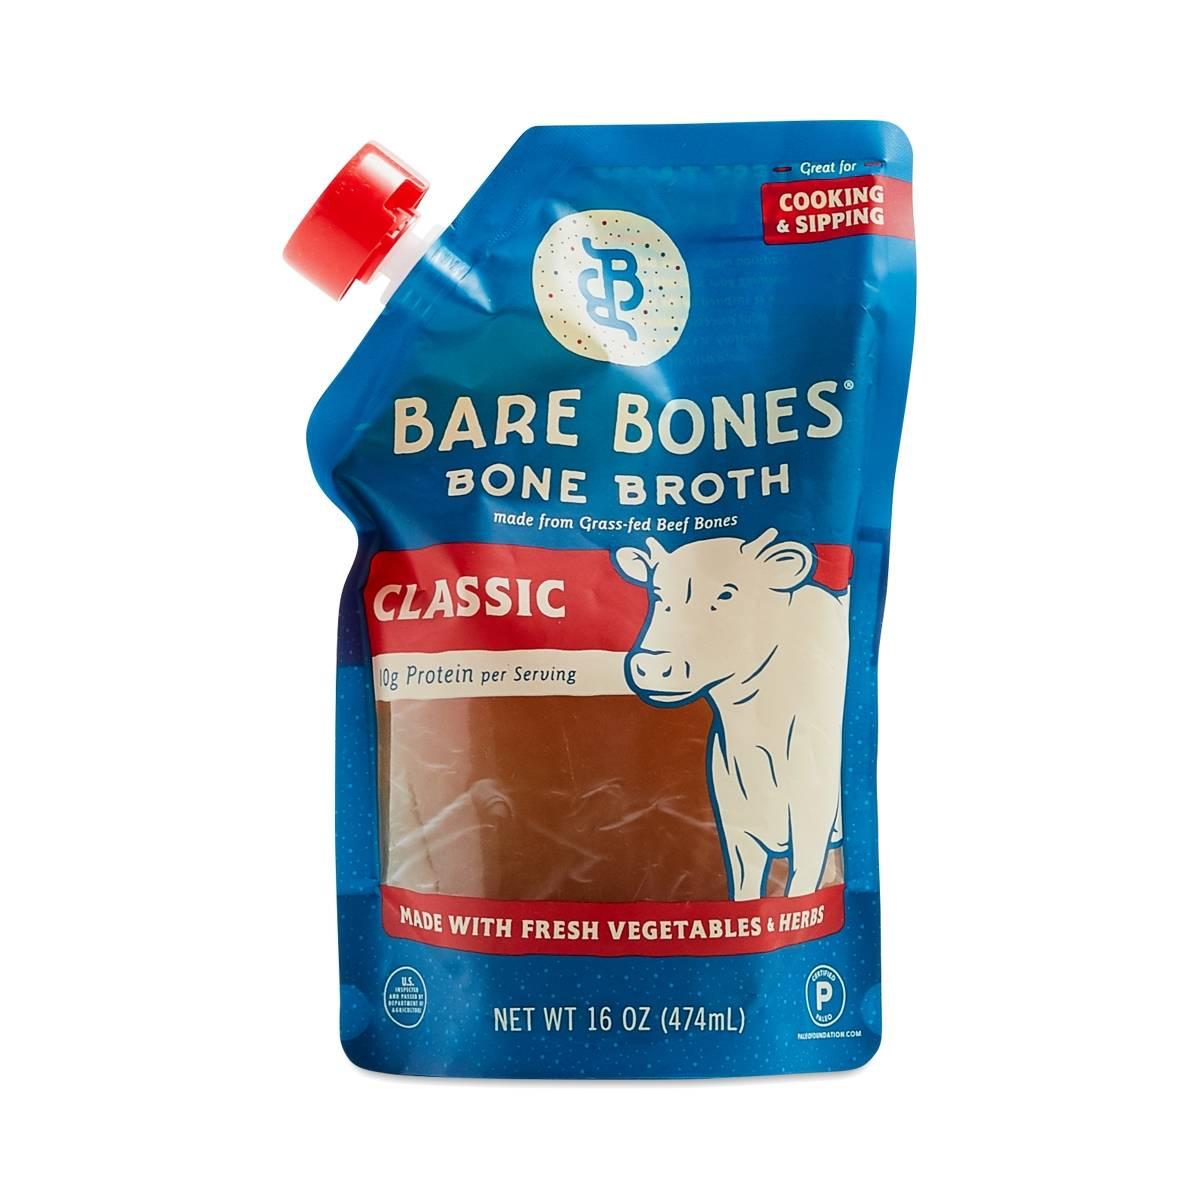 Classic Beef Bone Broth By Bare Bones Broth Thrive Market